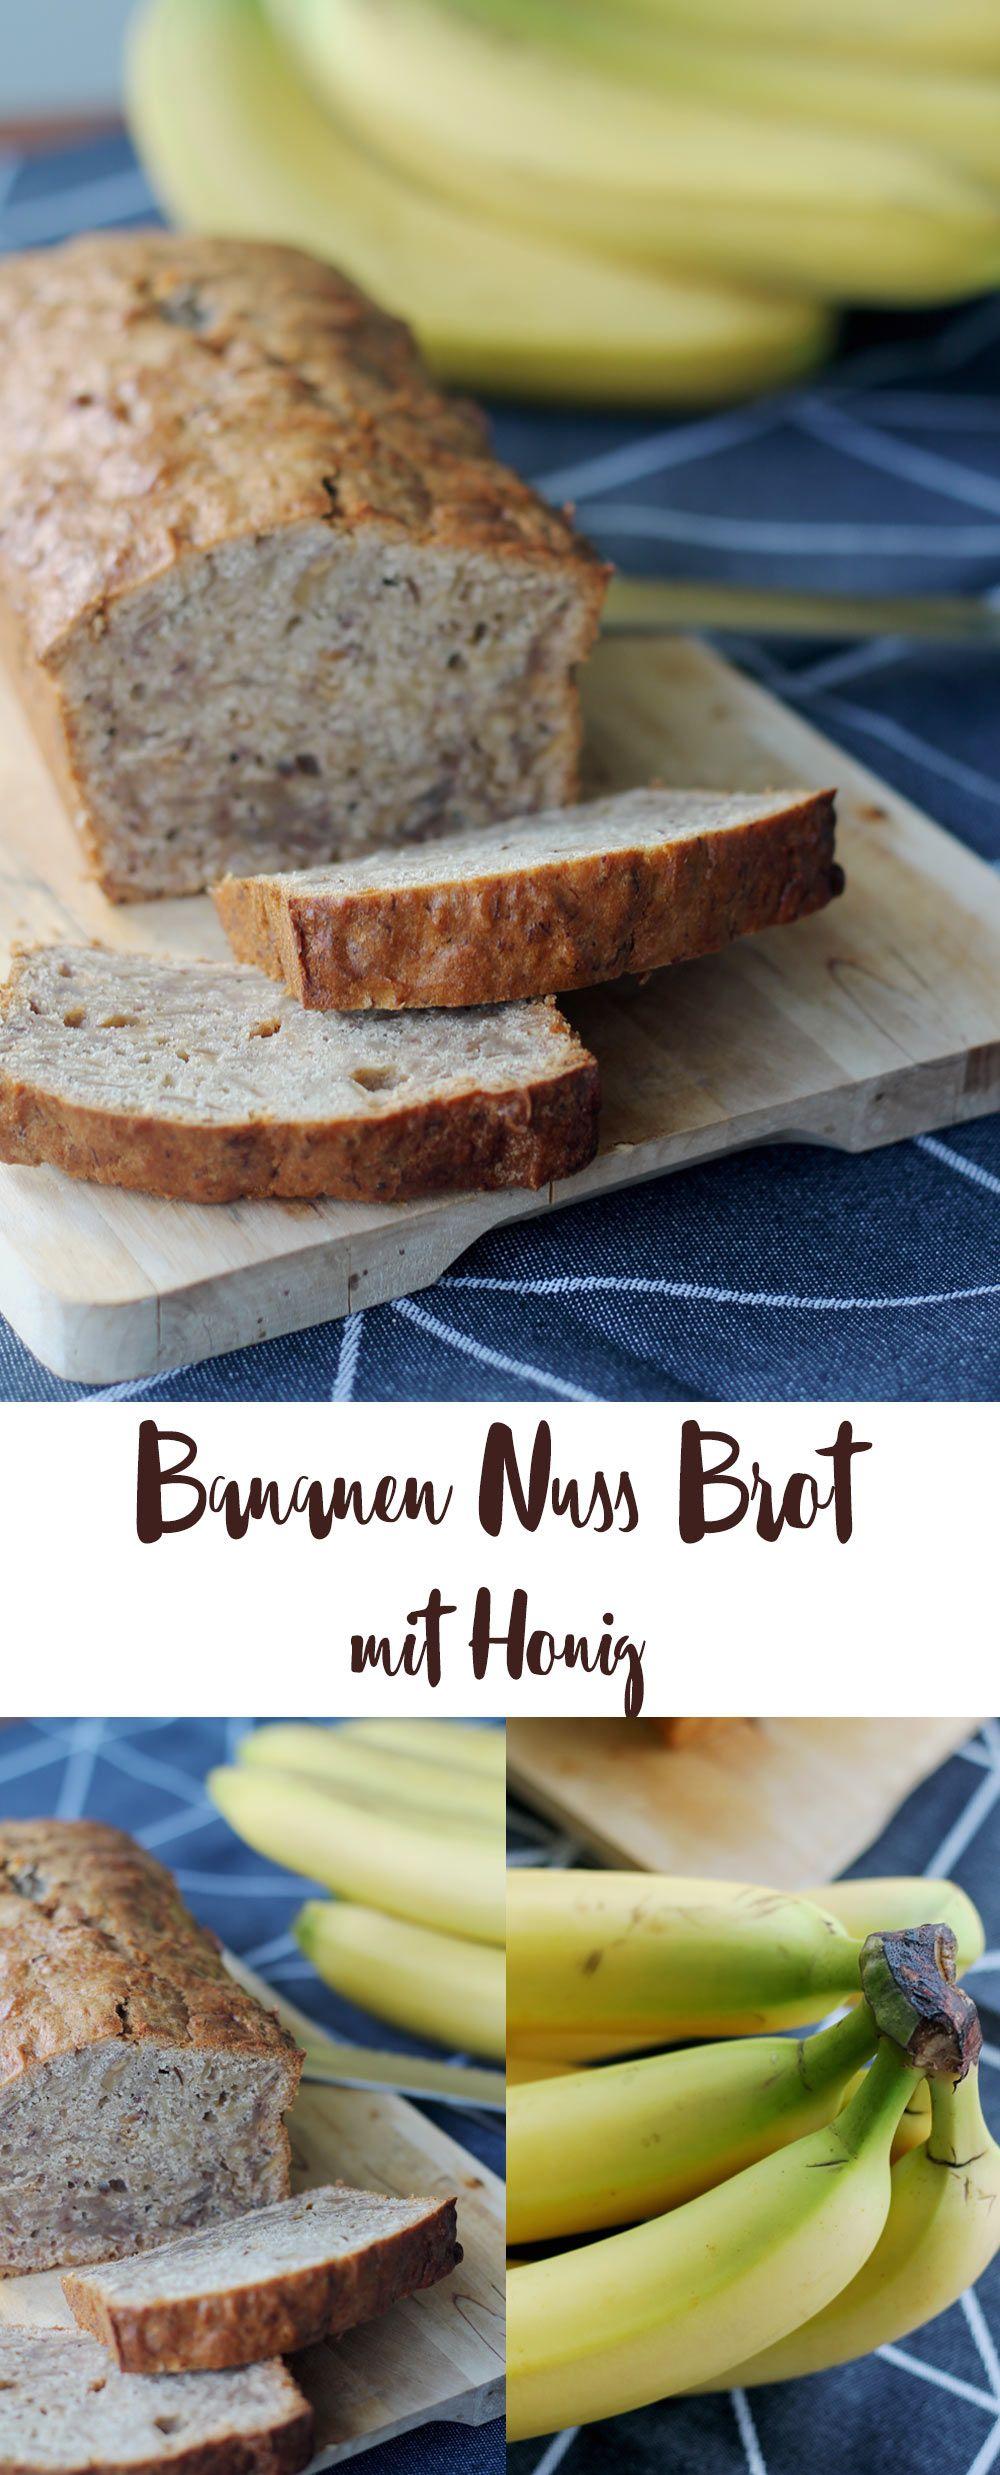 Bananen Nuss Brot mit Honig Rezept #frozenbananarecipes